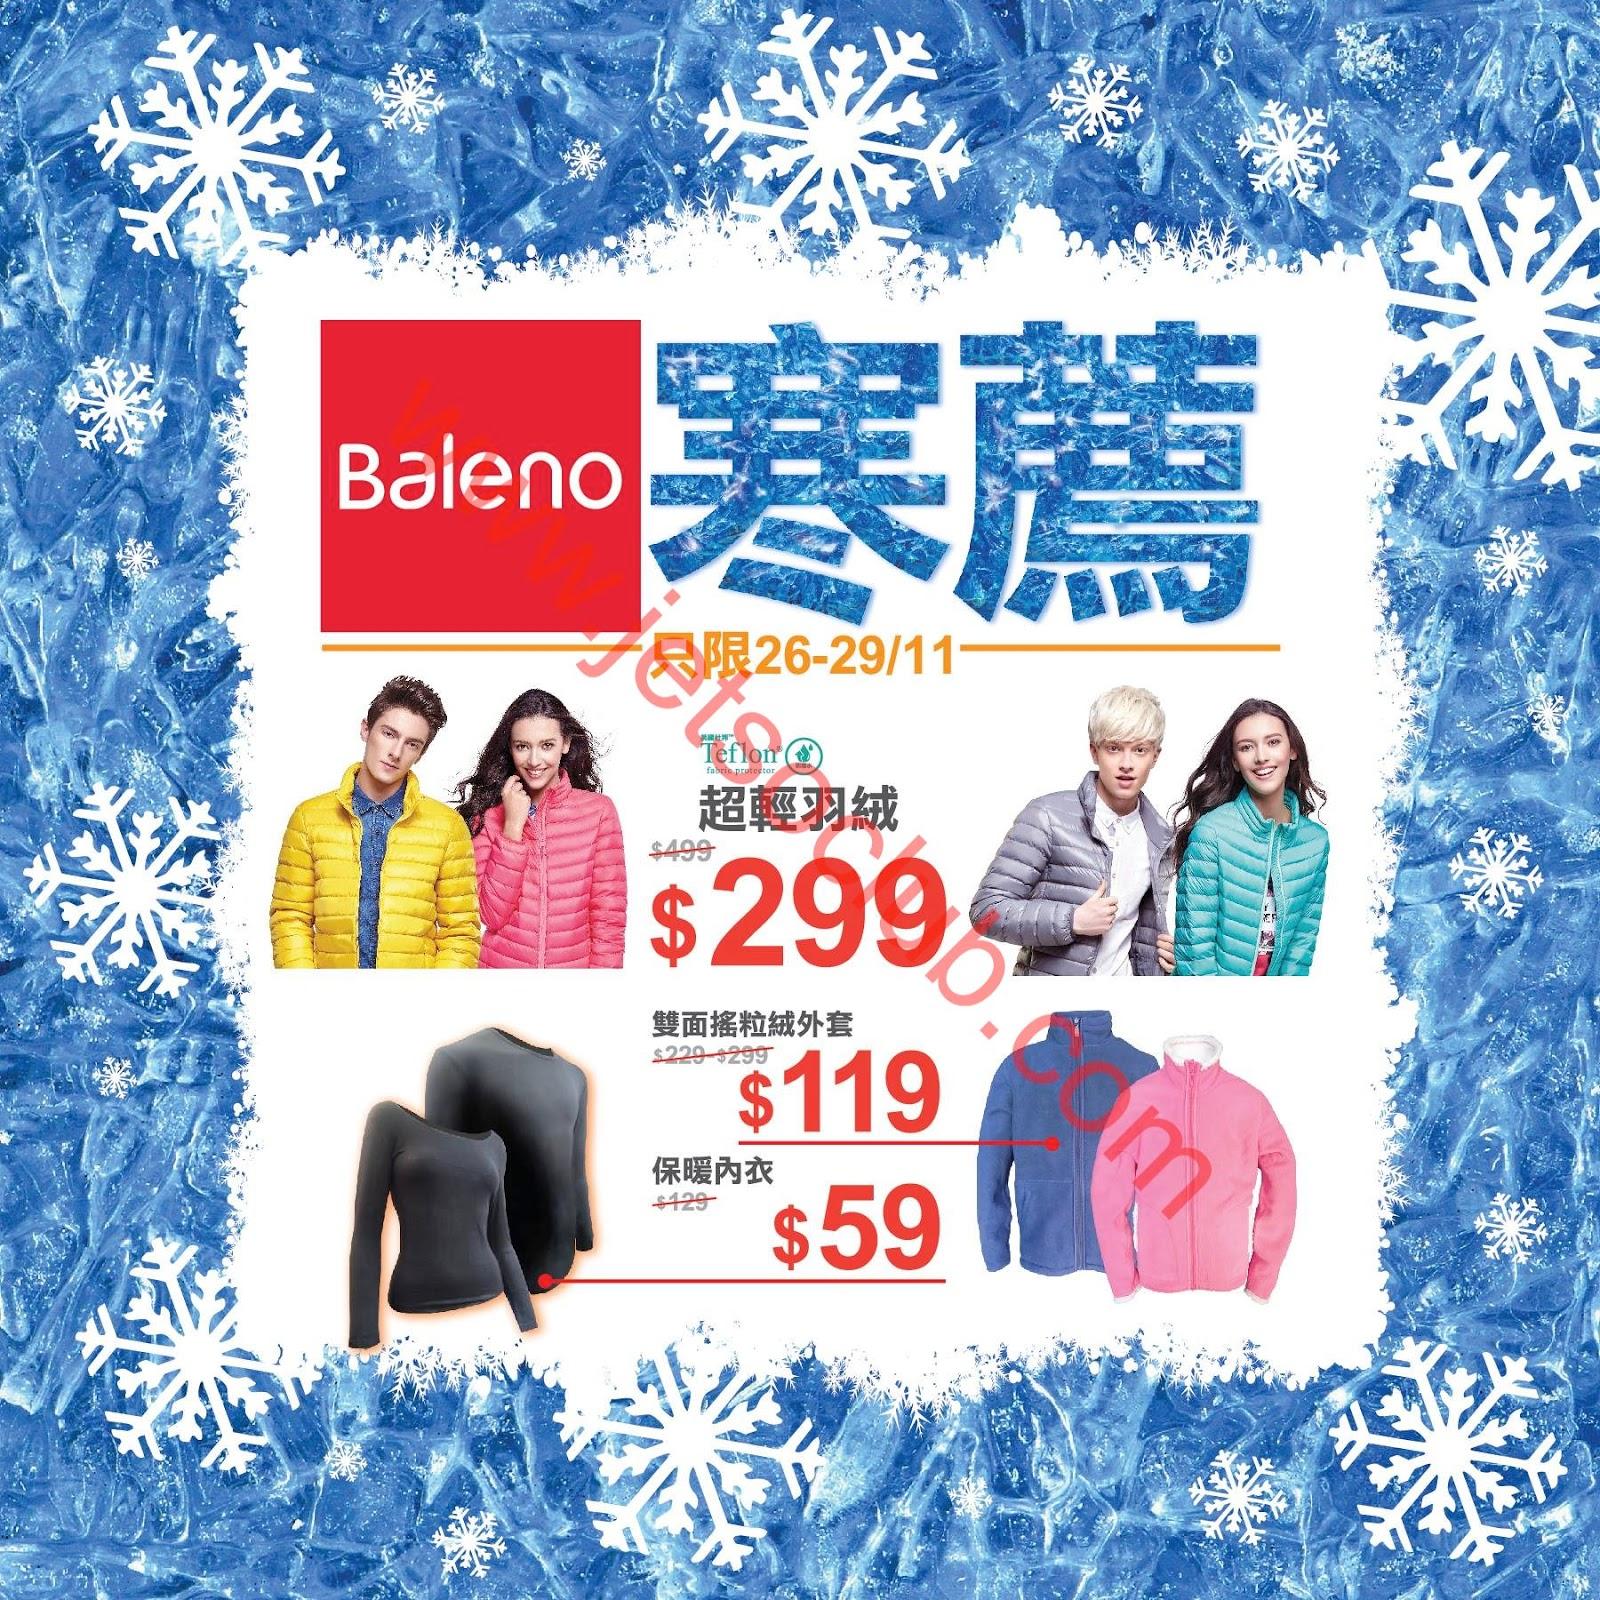 Baleno:羽絨/絨外套/保暖內衣 限時大特惠(26-29/11) ( Jetso Club 著數俱樂部 )